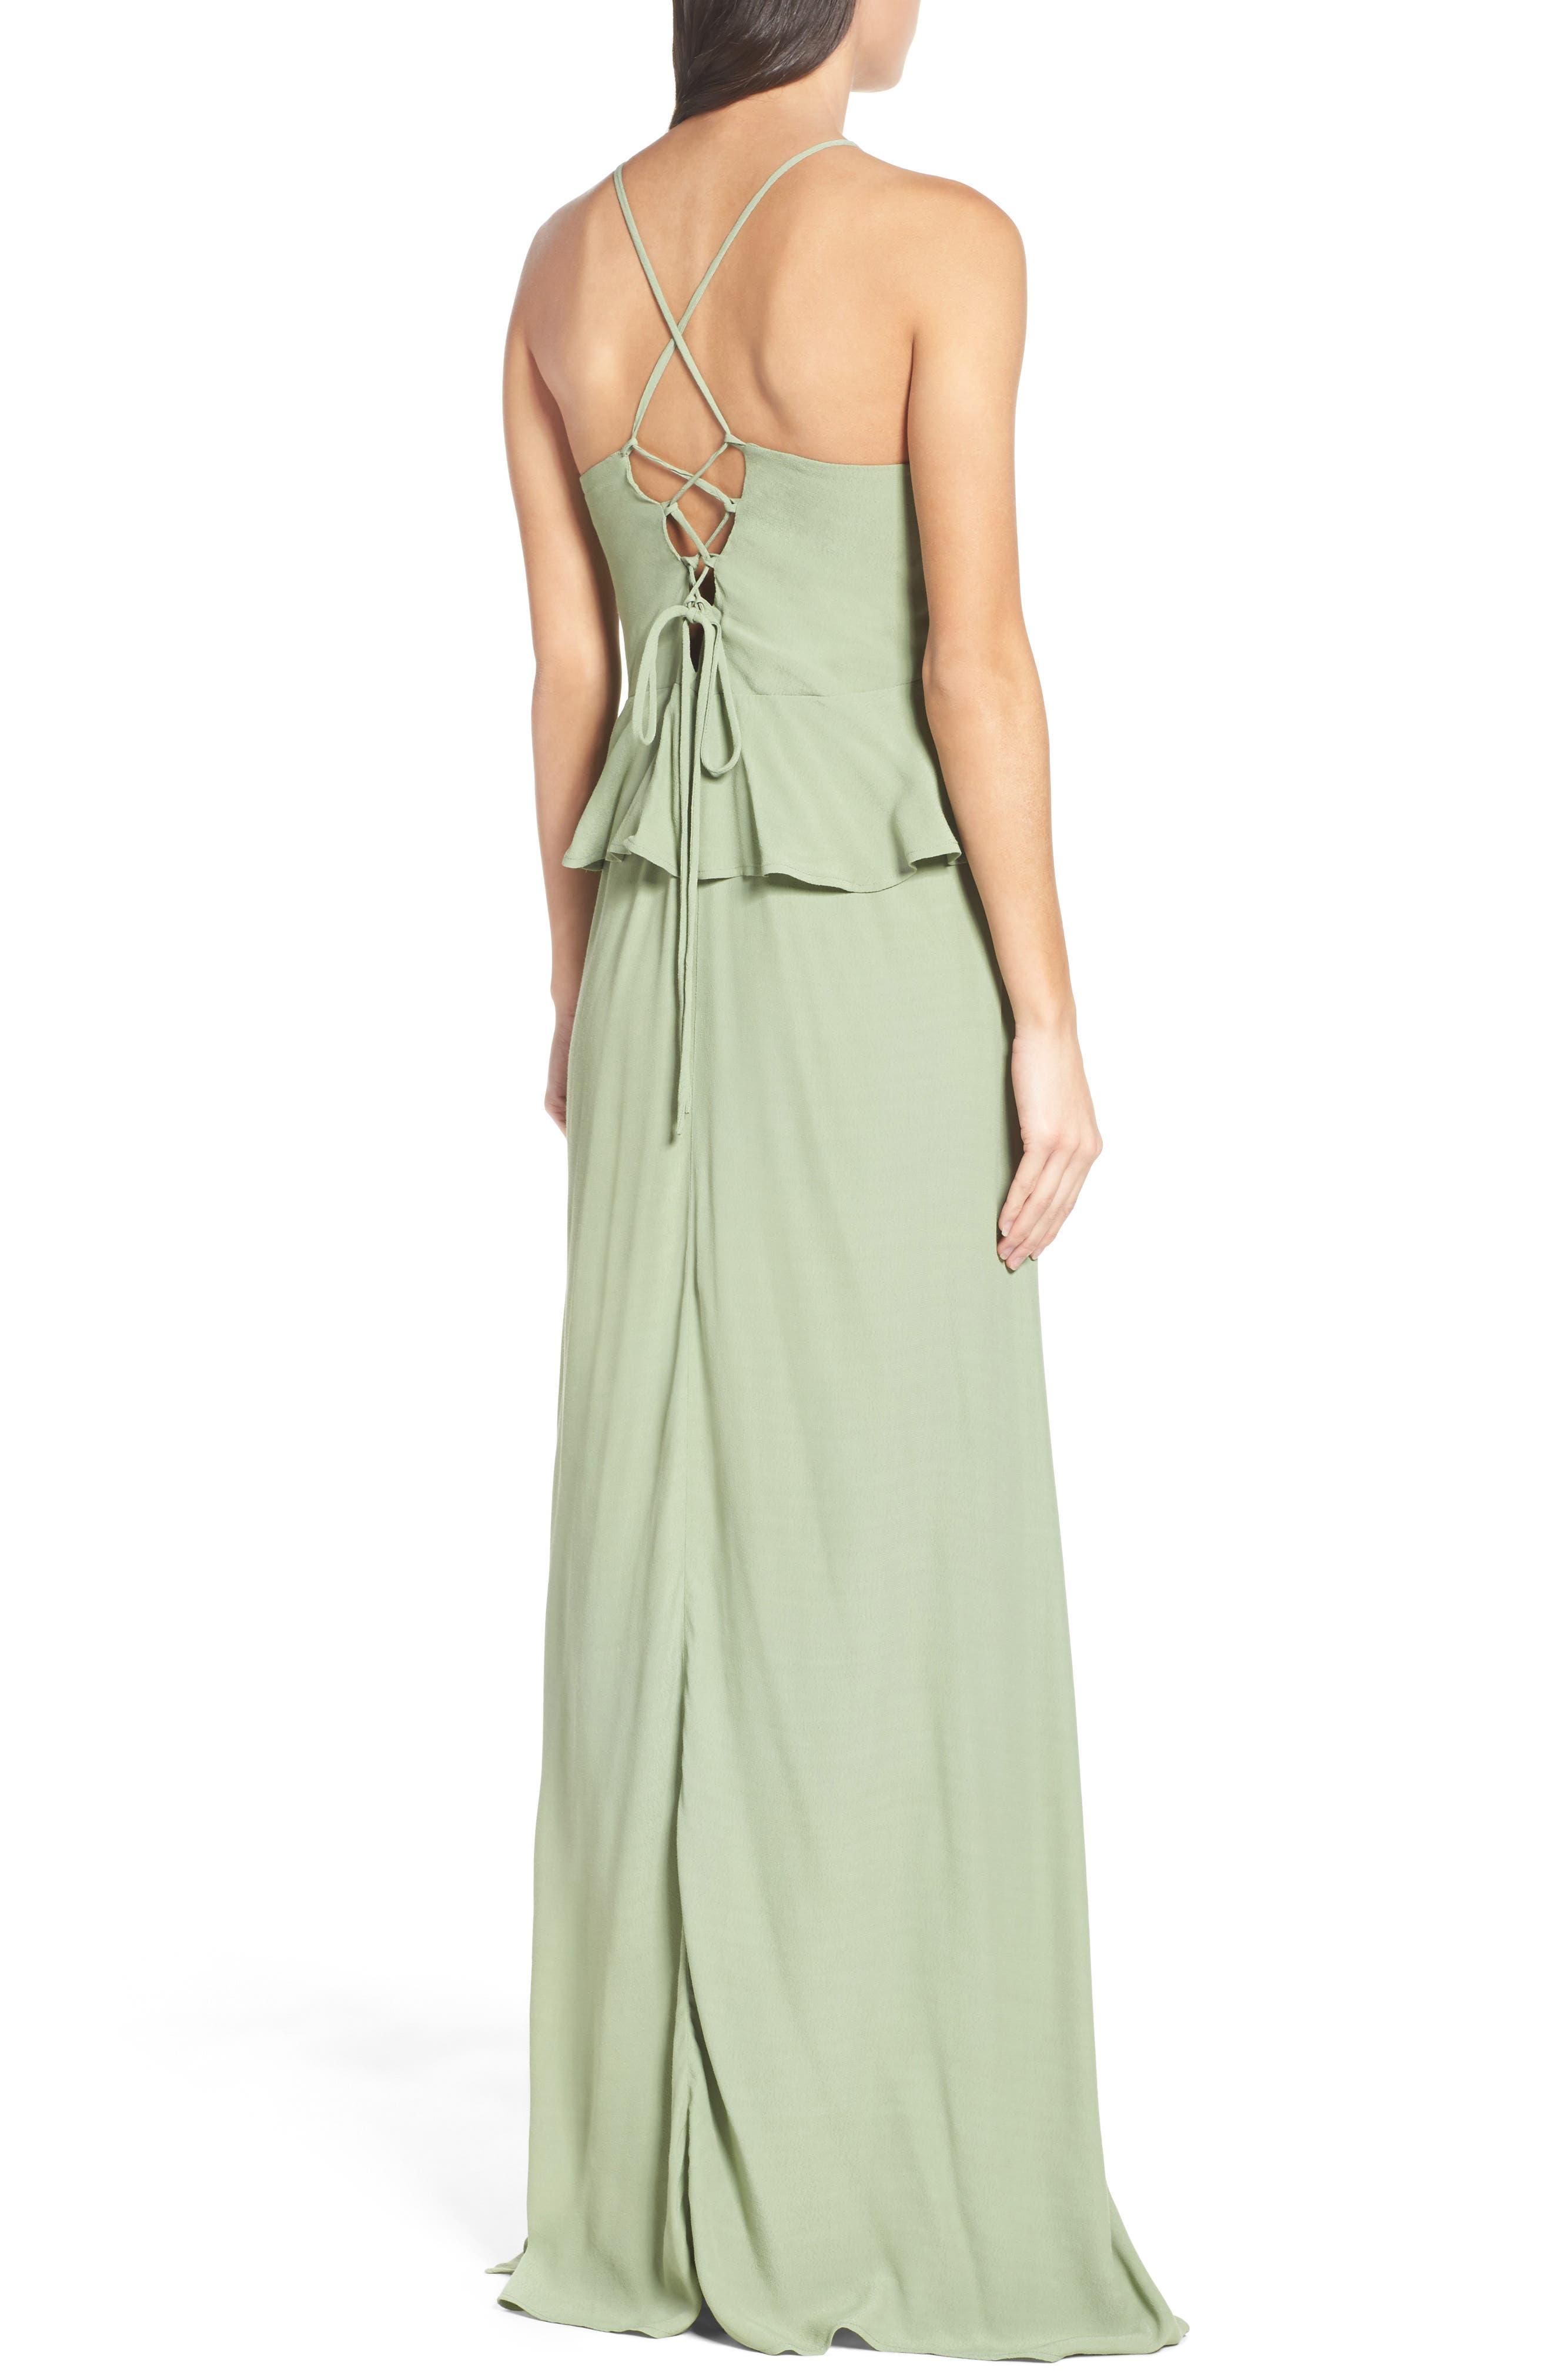 Roe + May Jolie Crepe Peplum Dress,                             Alternate thumbnail 3, color,